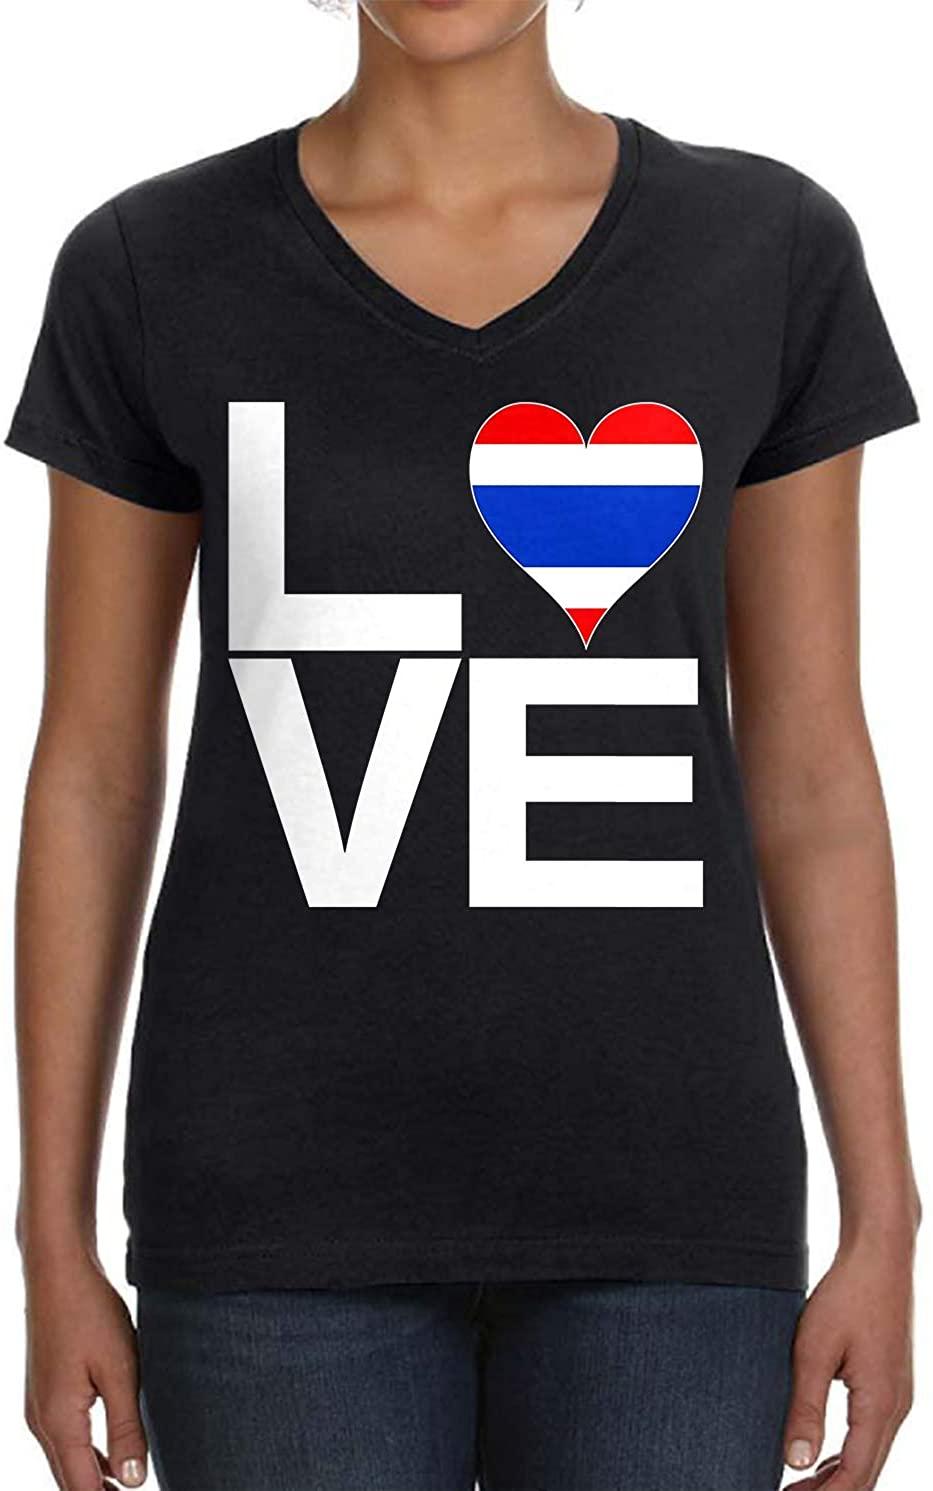 Tenacitee Women's Love Block Thailand Heart V-Neck T-Shirt